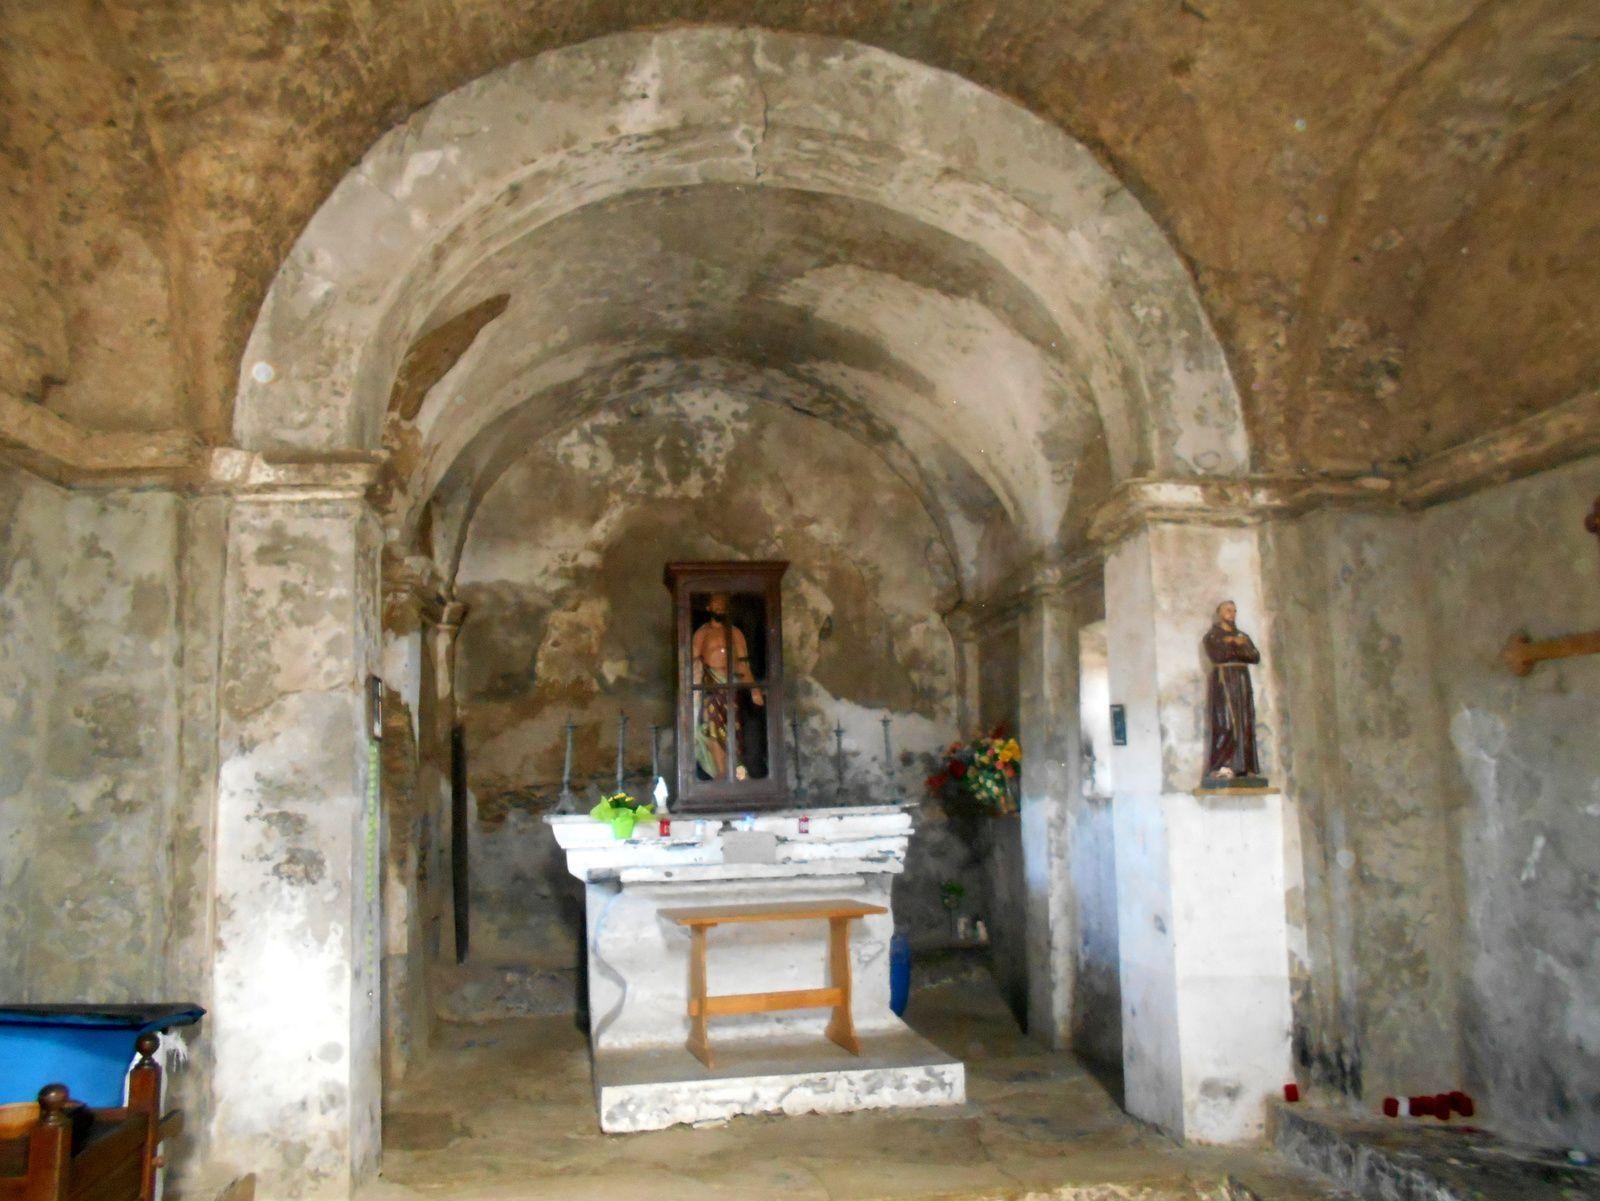 Randonnée du 03 septembre 2017 : Piazzole - Chapelle San Bertolomeo - Pietra Giusta - Alzi